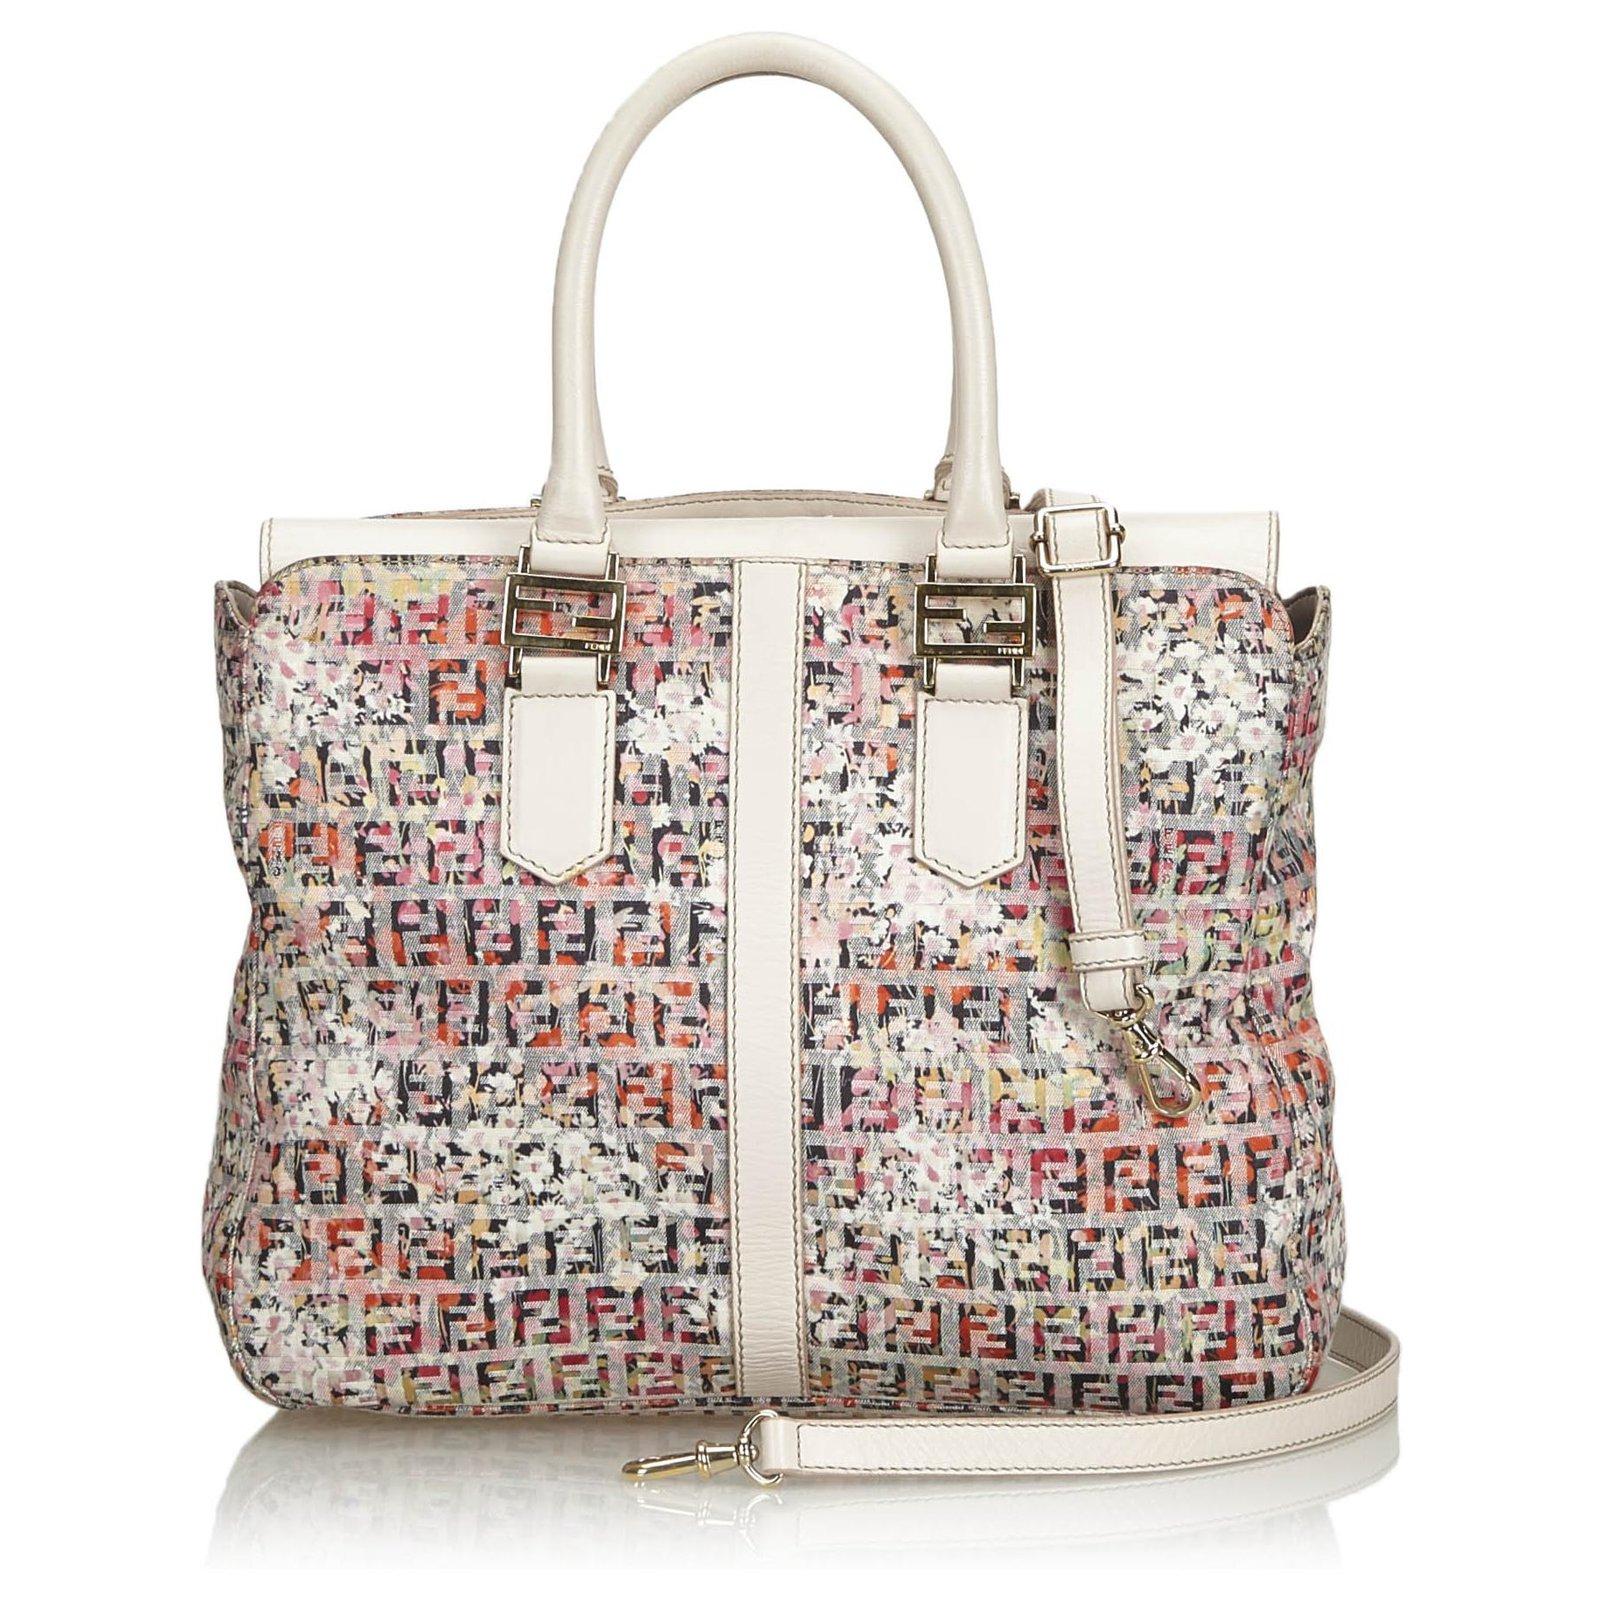 f539cbfccd6 Fendi Pink Zucchino Printed Canvas Handbag